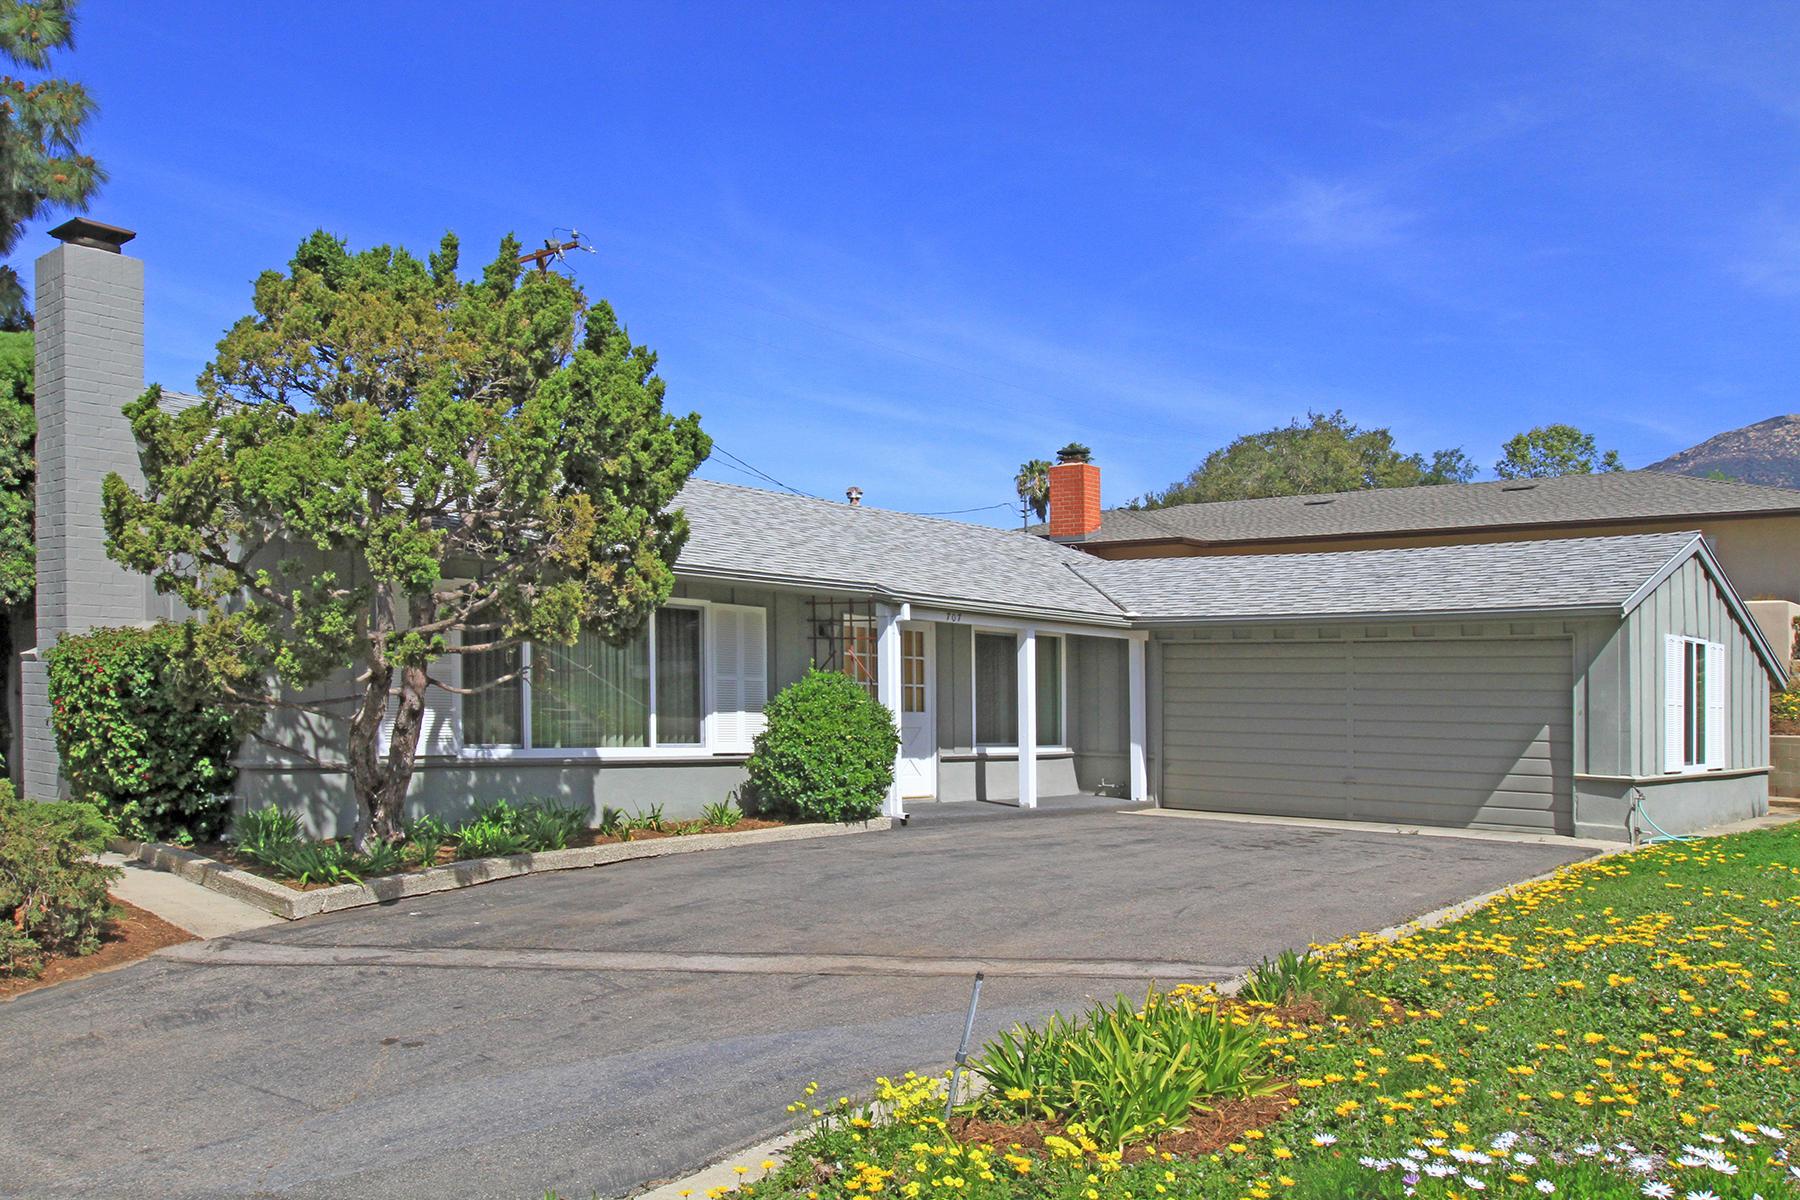 Property photo for 707 N Ontare Rd Santa Barbara, California 93105 - 18-1207